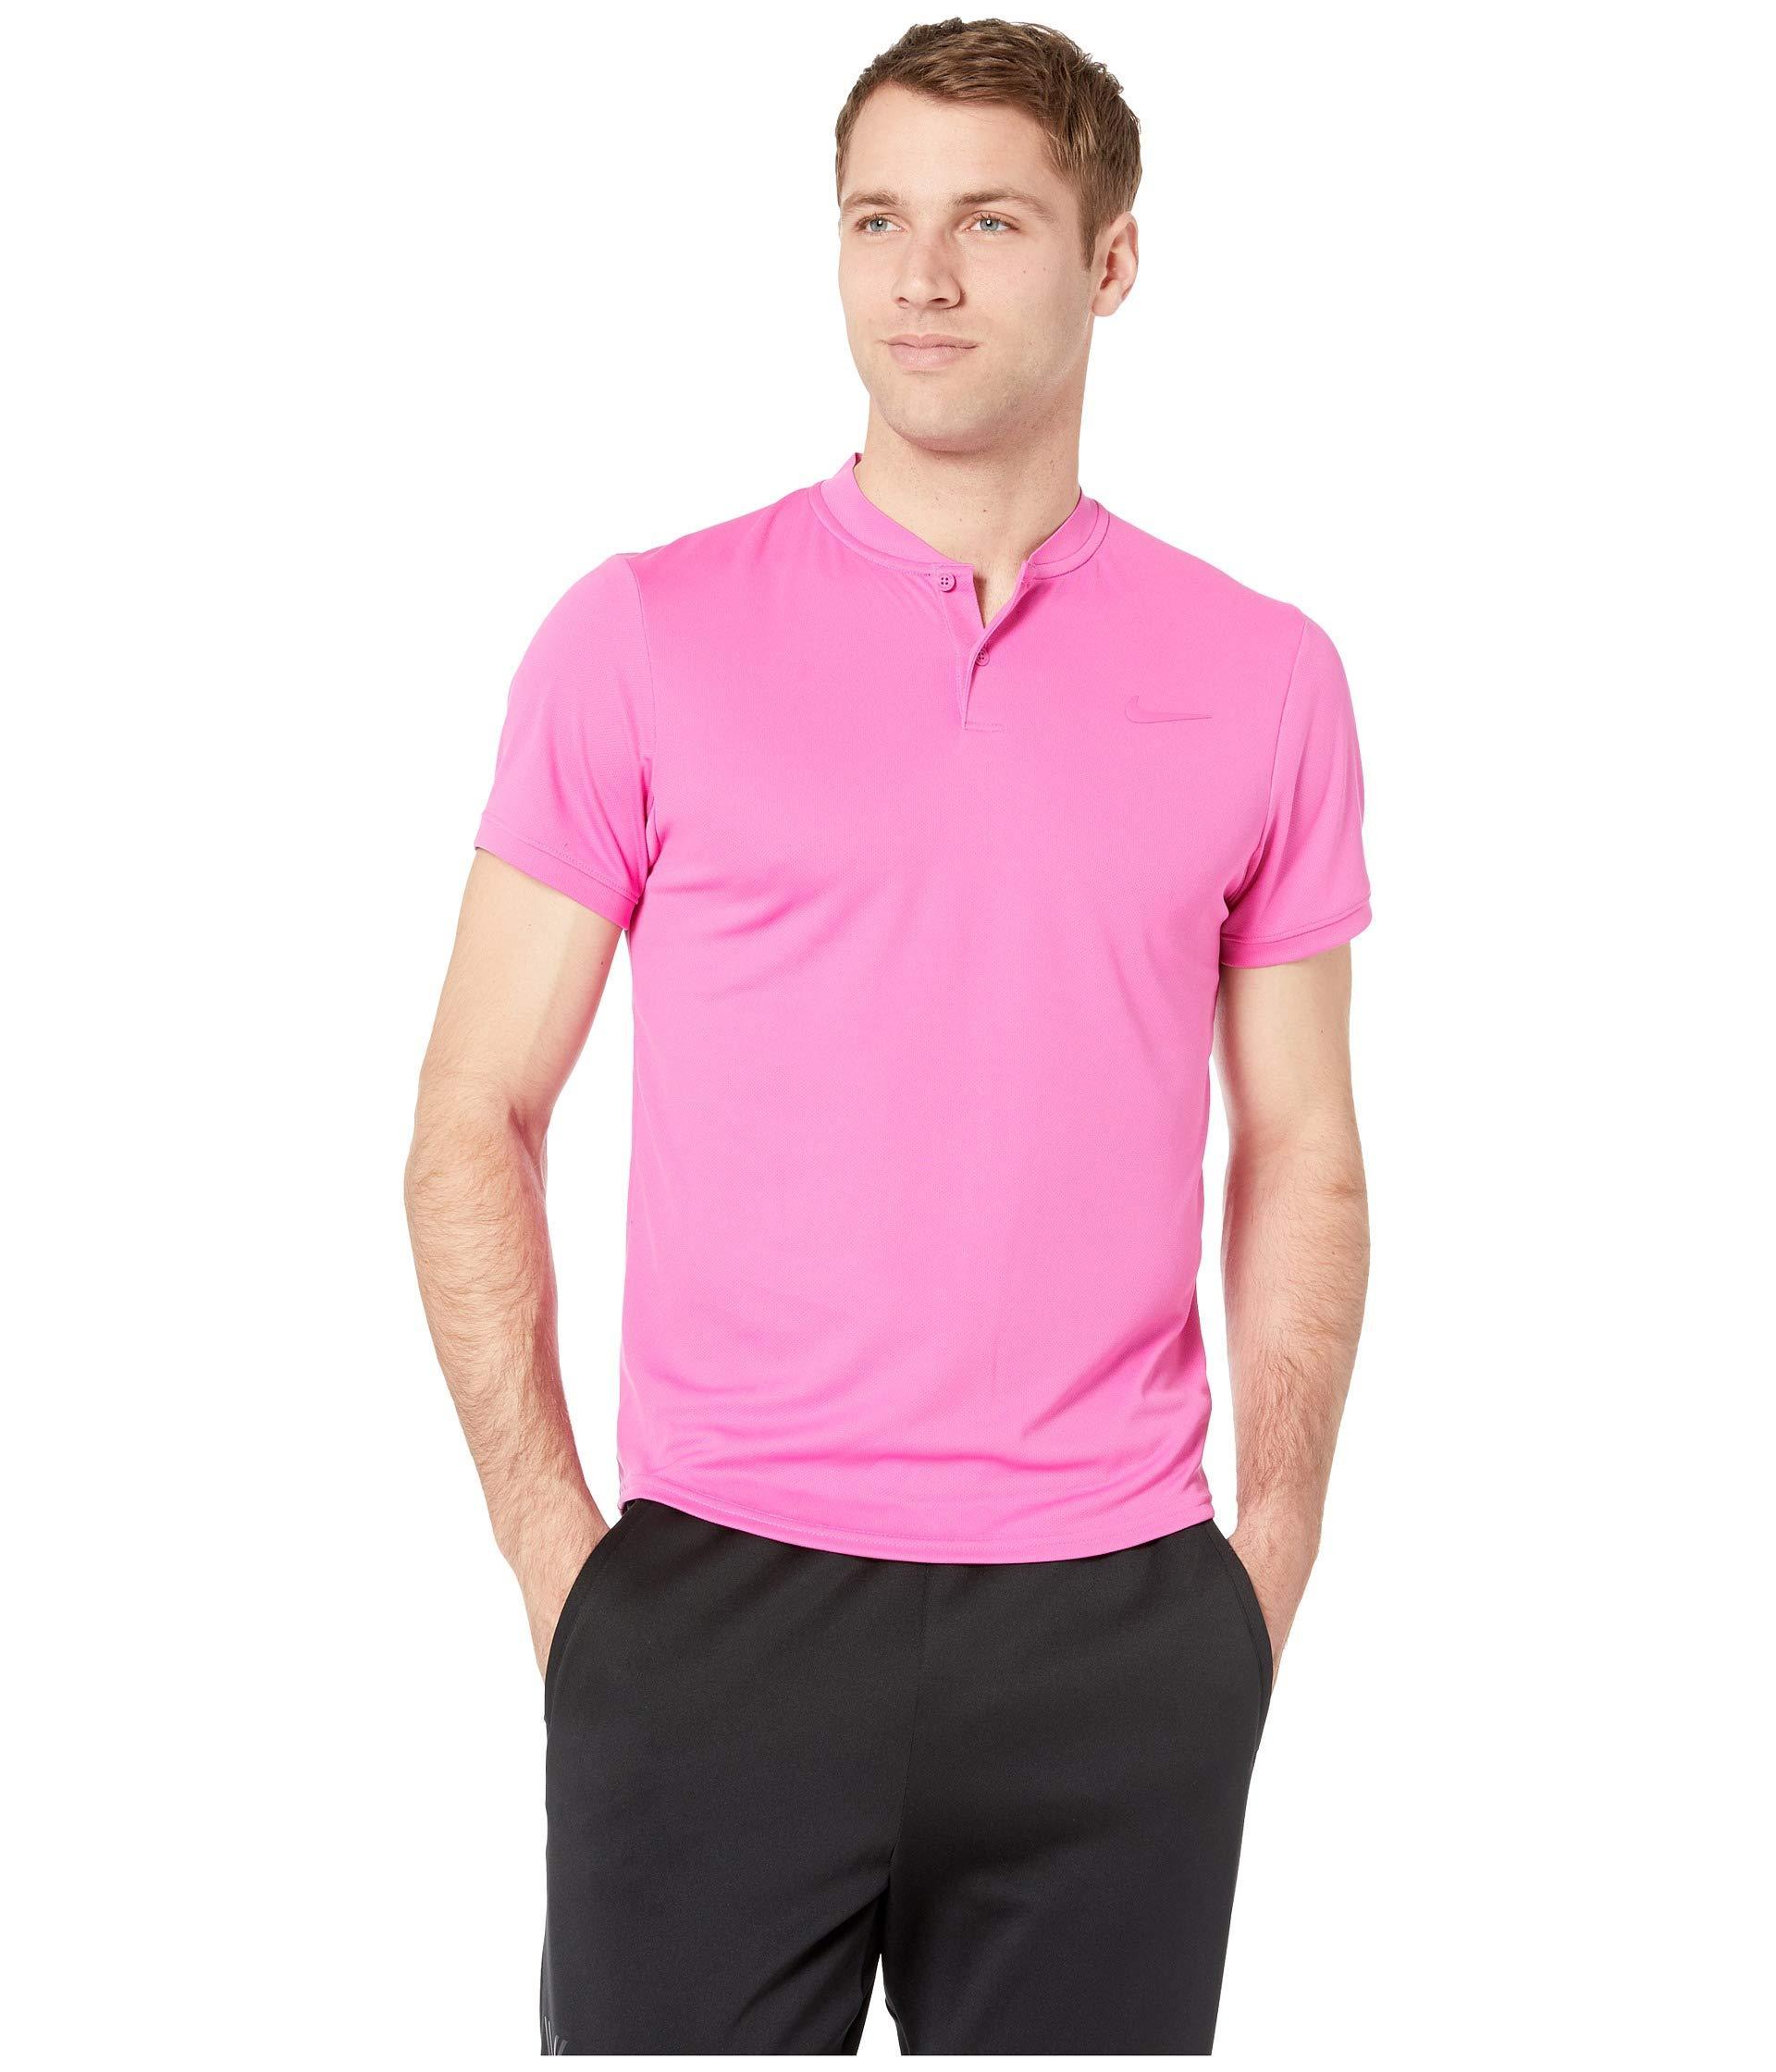 31e195ab Lyst - Nike Court Dry Polo Blade (black/white) Men's Clothing in ...